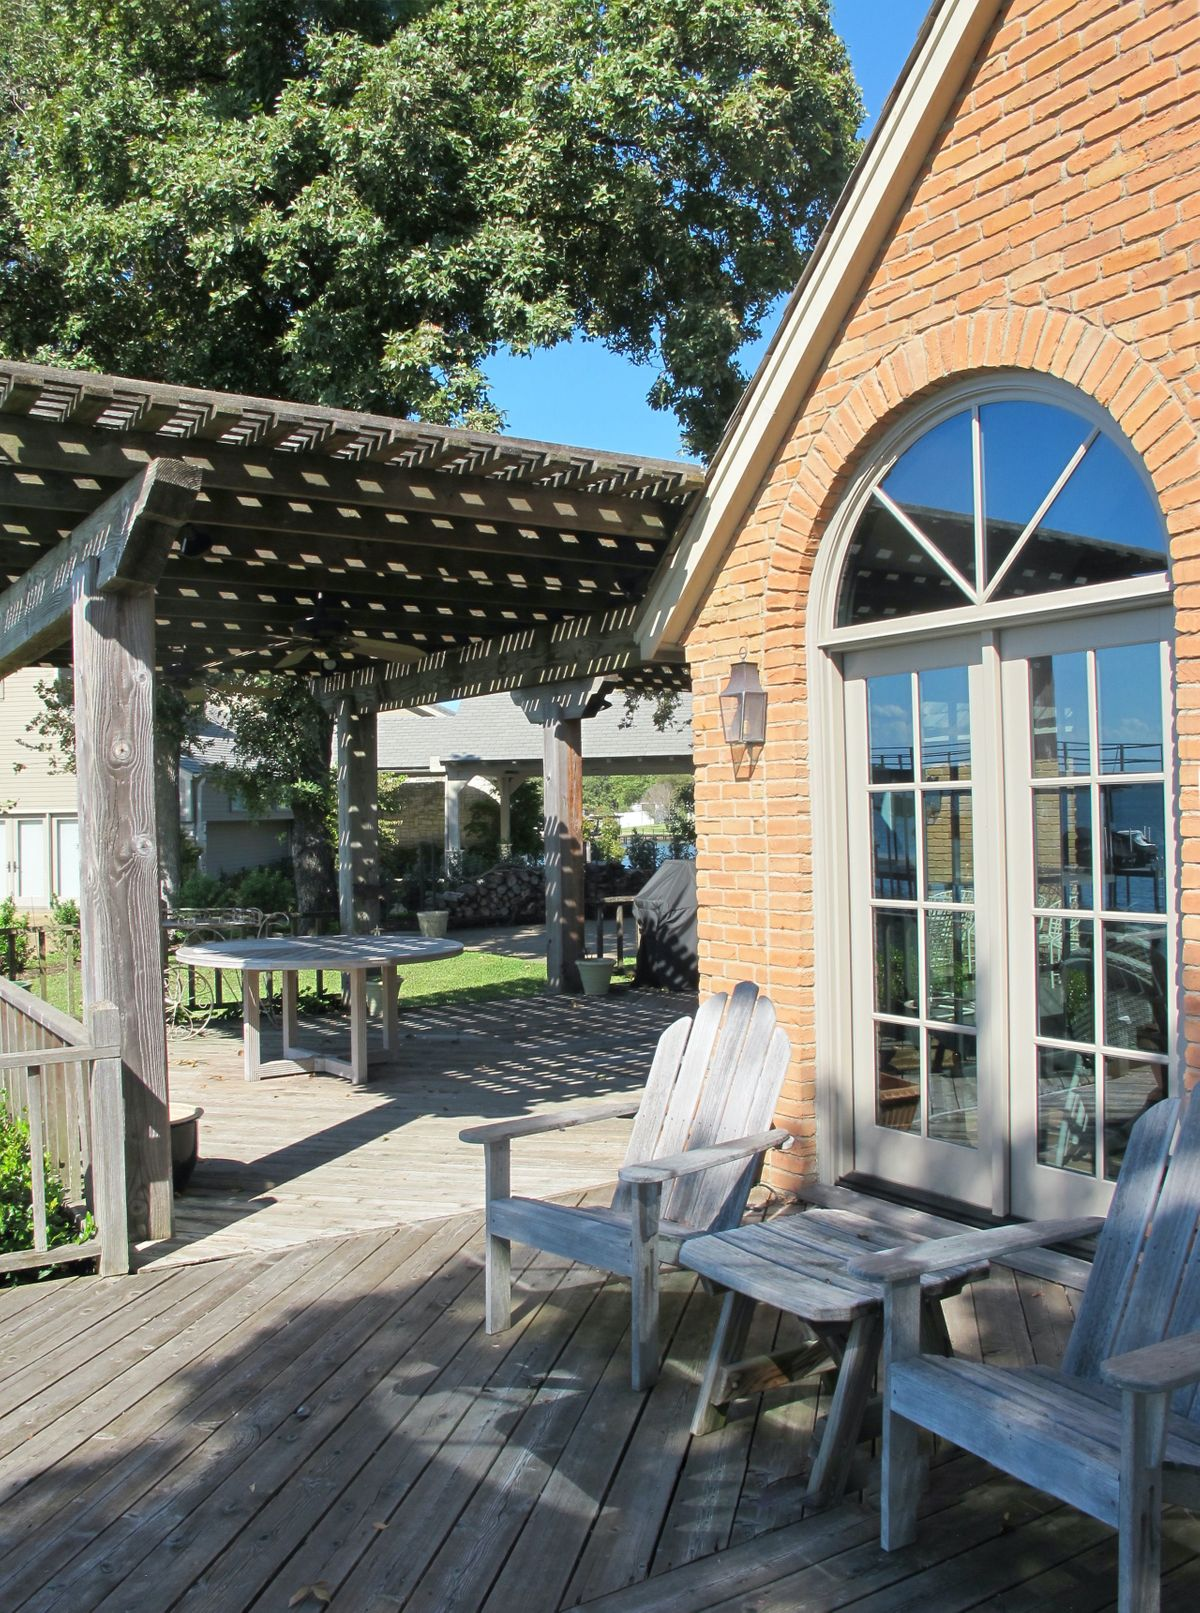 Pola Lakehouse Video Shoot Location Homes Dallas 46.jpg